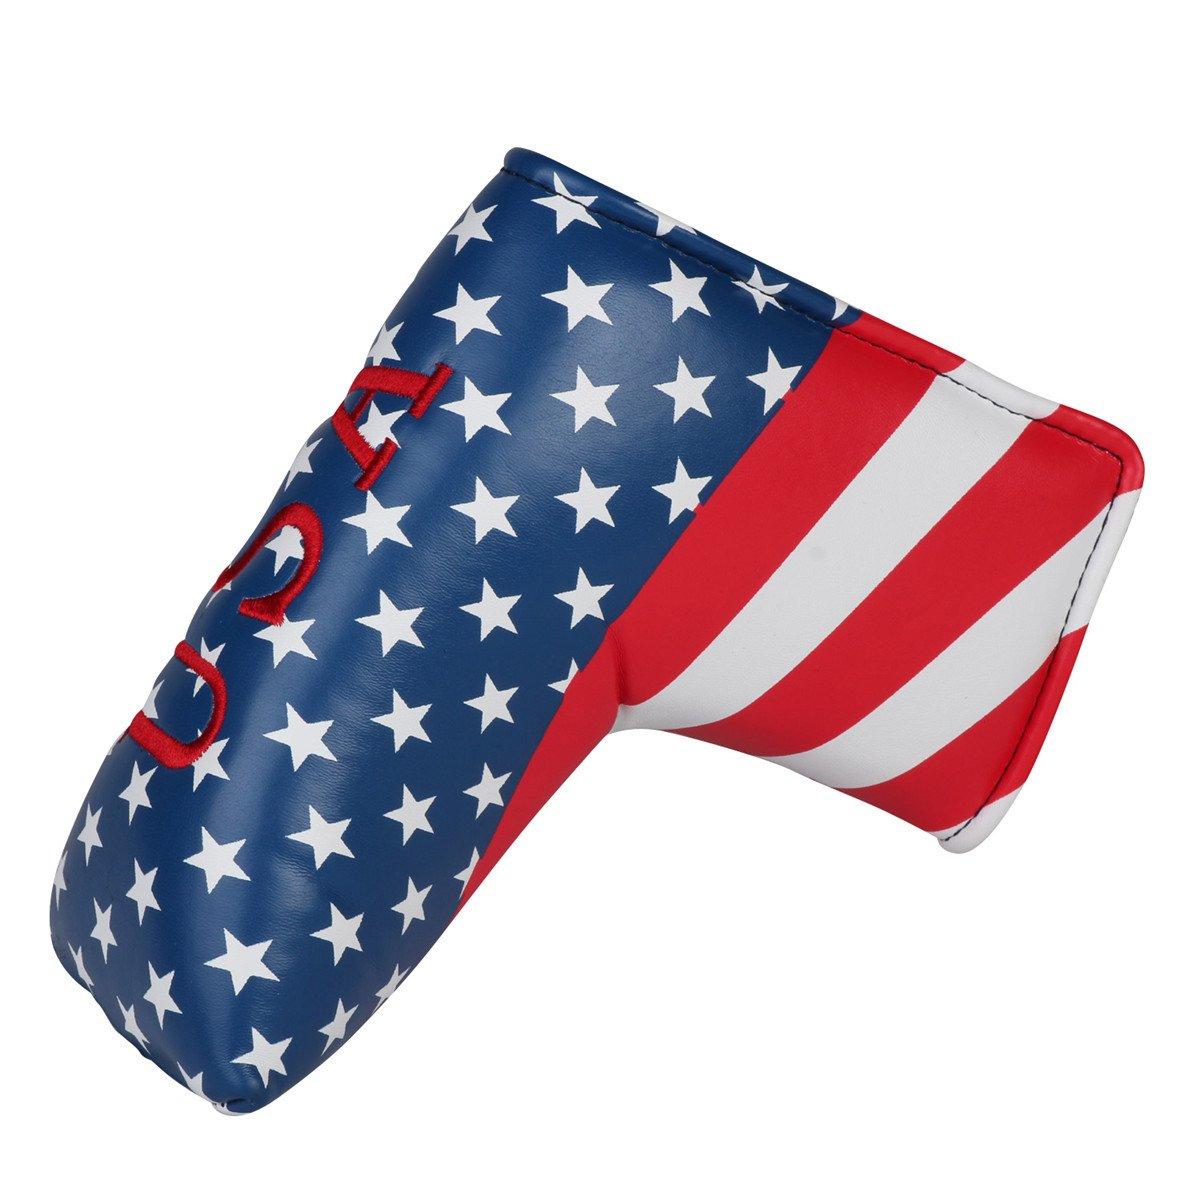 USA Starts and Stripes ゴルフパターヘッドカバー ブレードパターカバー Scotty Cameron Taylormade Odyssey Golf Builder用   B07LGRJZRQ